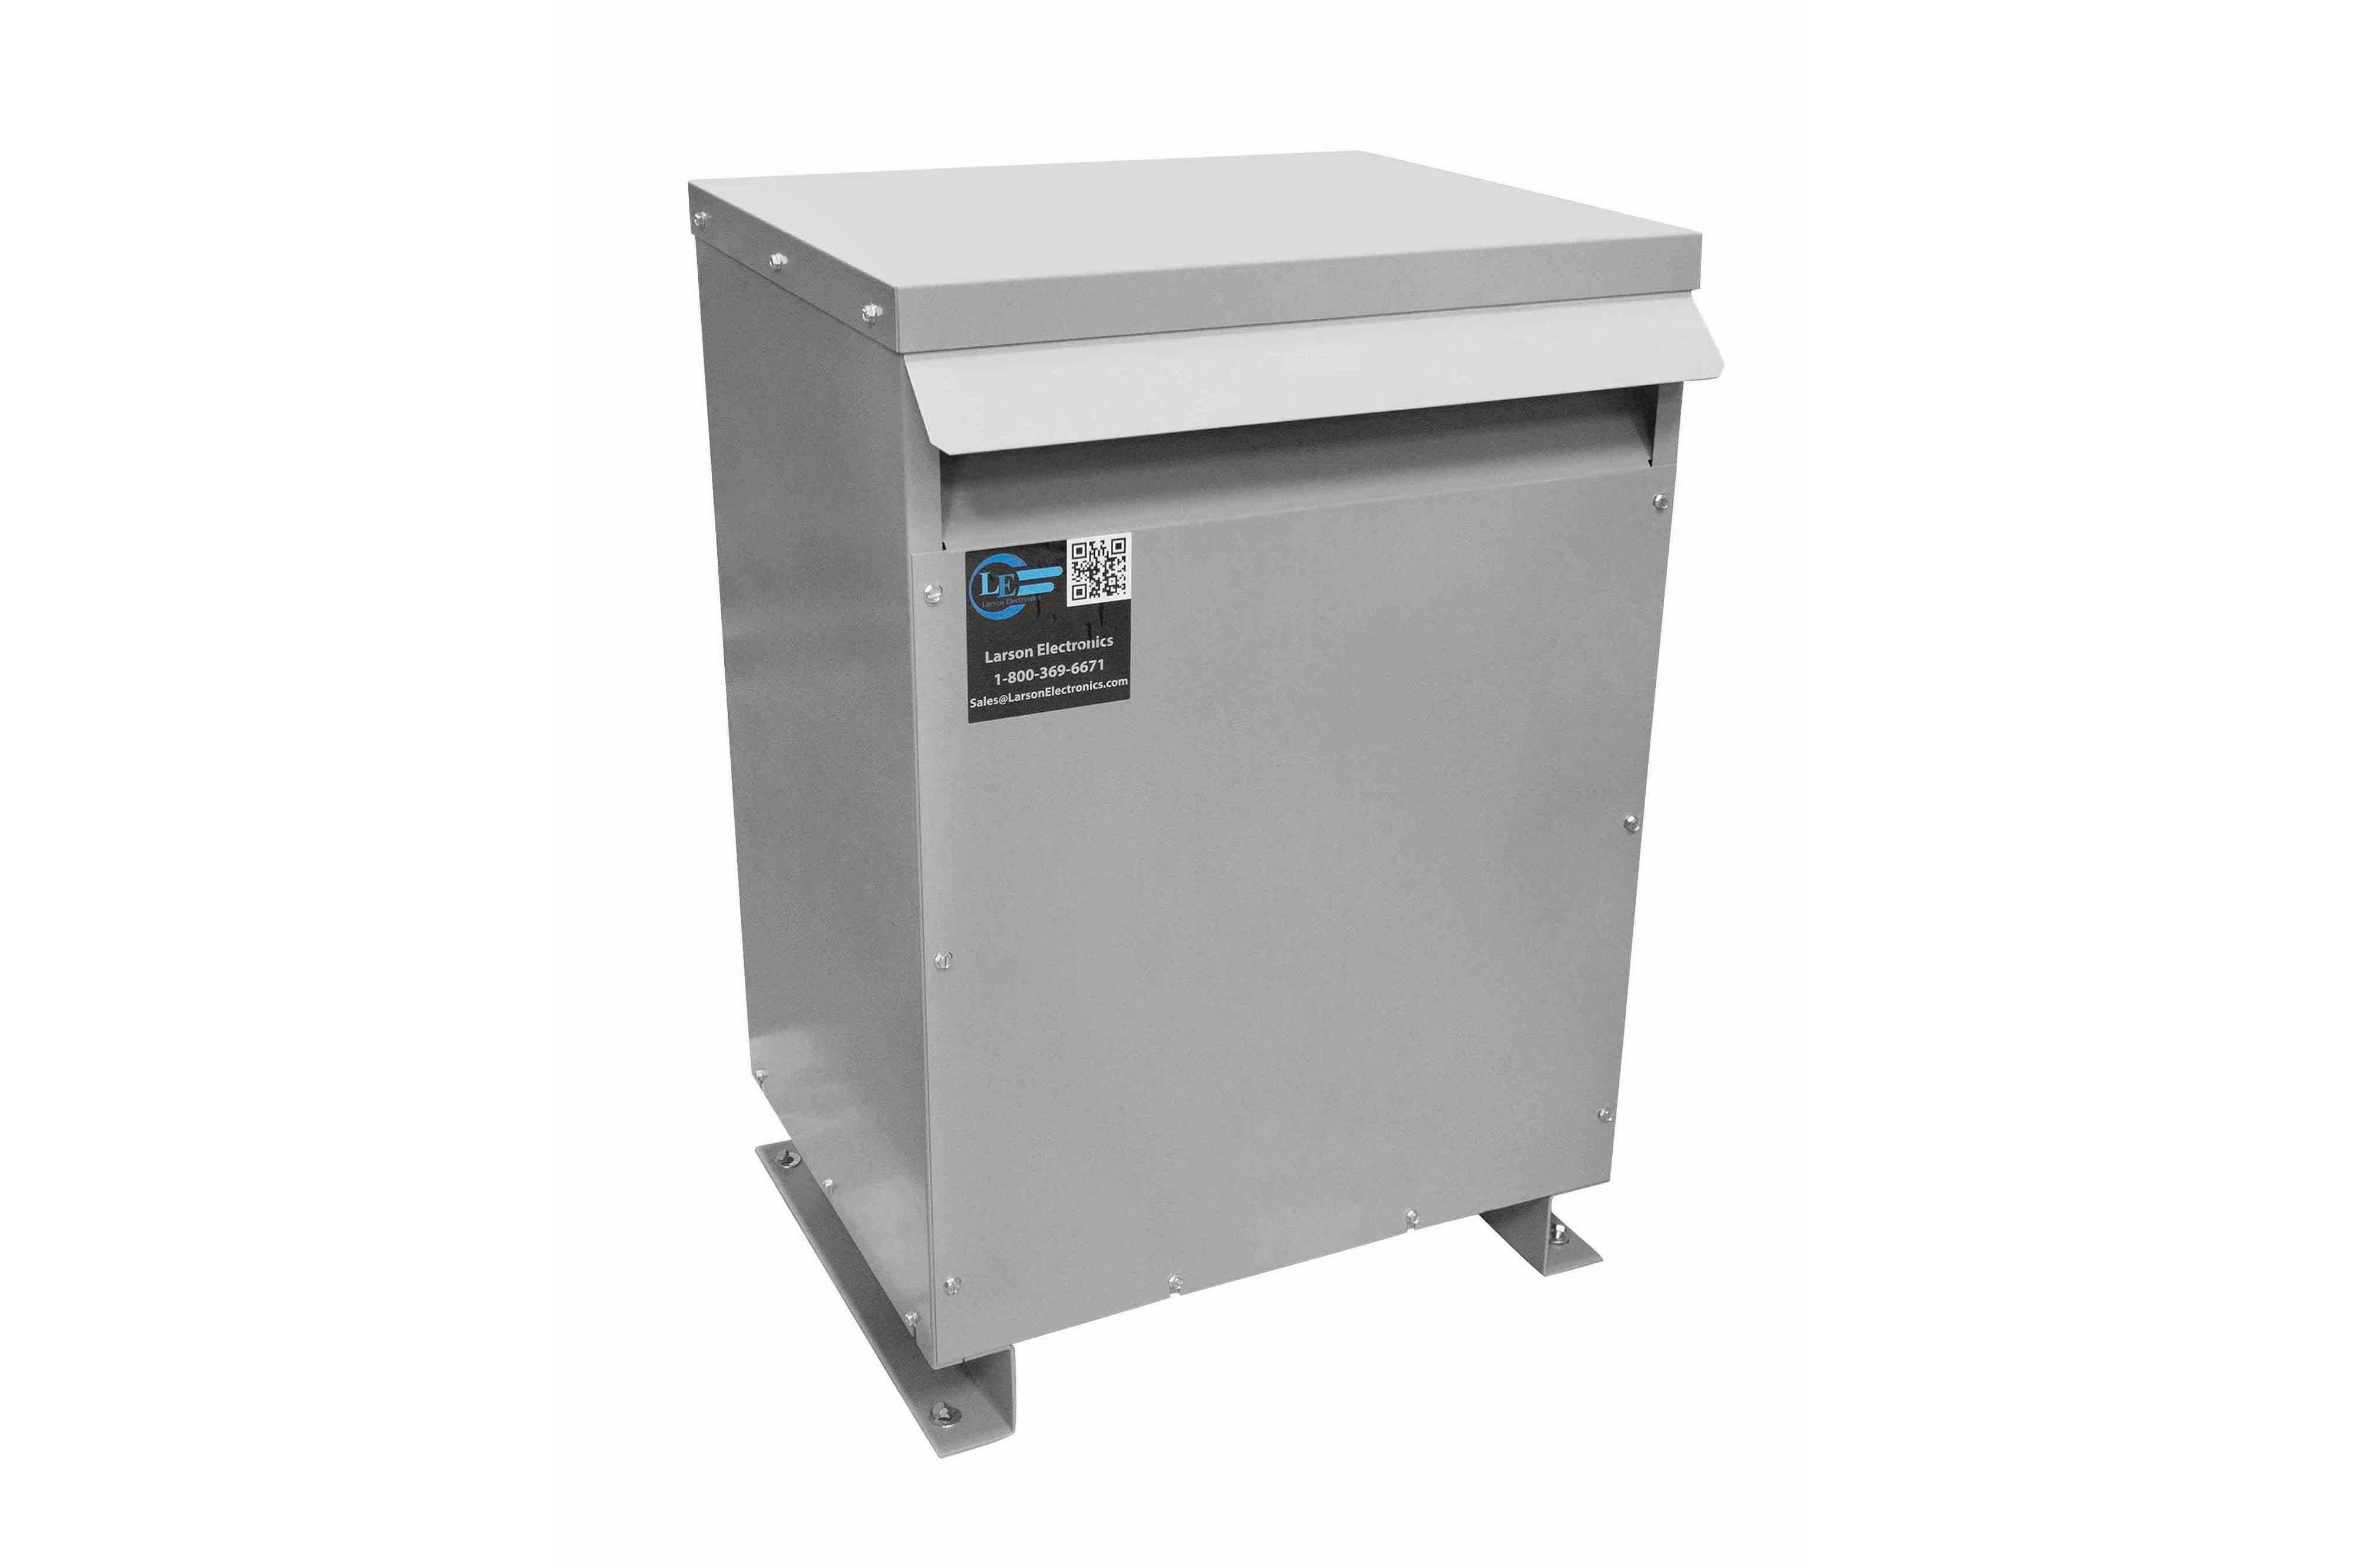 26 kVA 3PH Isolation Transformer, 230V Wye Primary, 208V Delta Secondary, N3R, Ventilated, 60 Hz